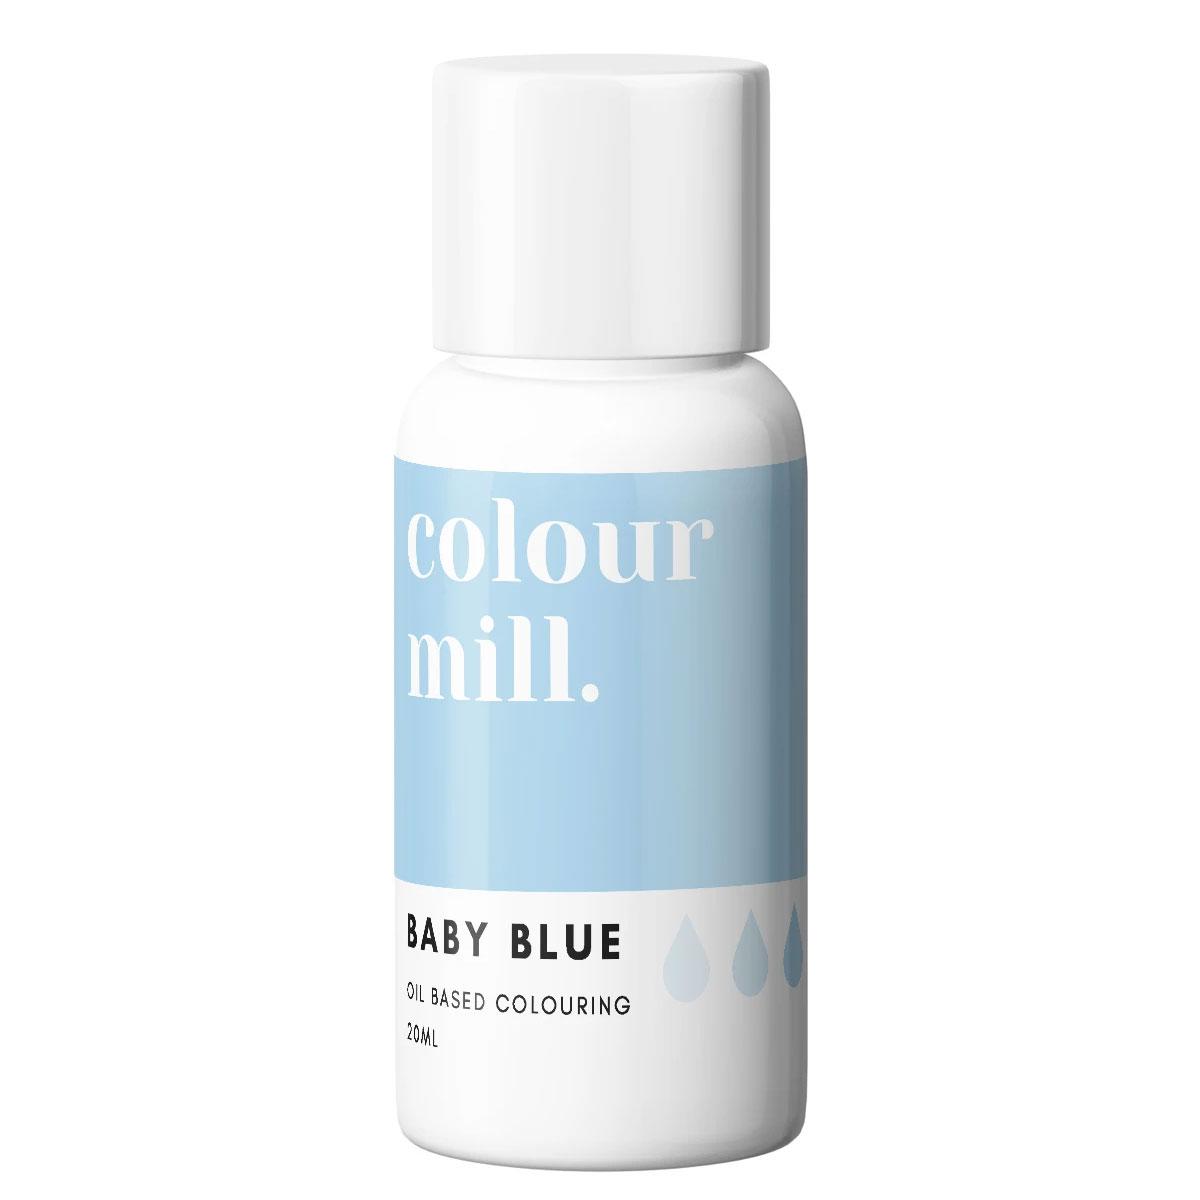 Colour Mill fettlösliche Lebensmittelfarbe - Baby Blue 20ml